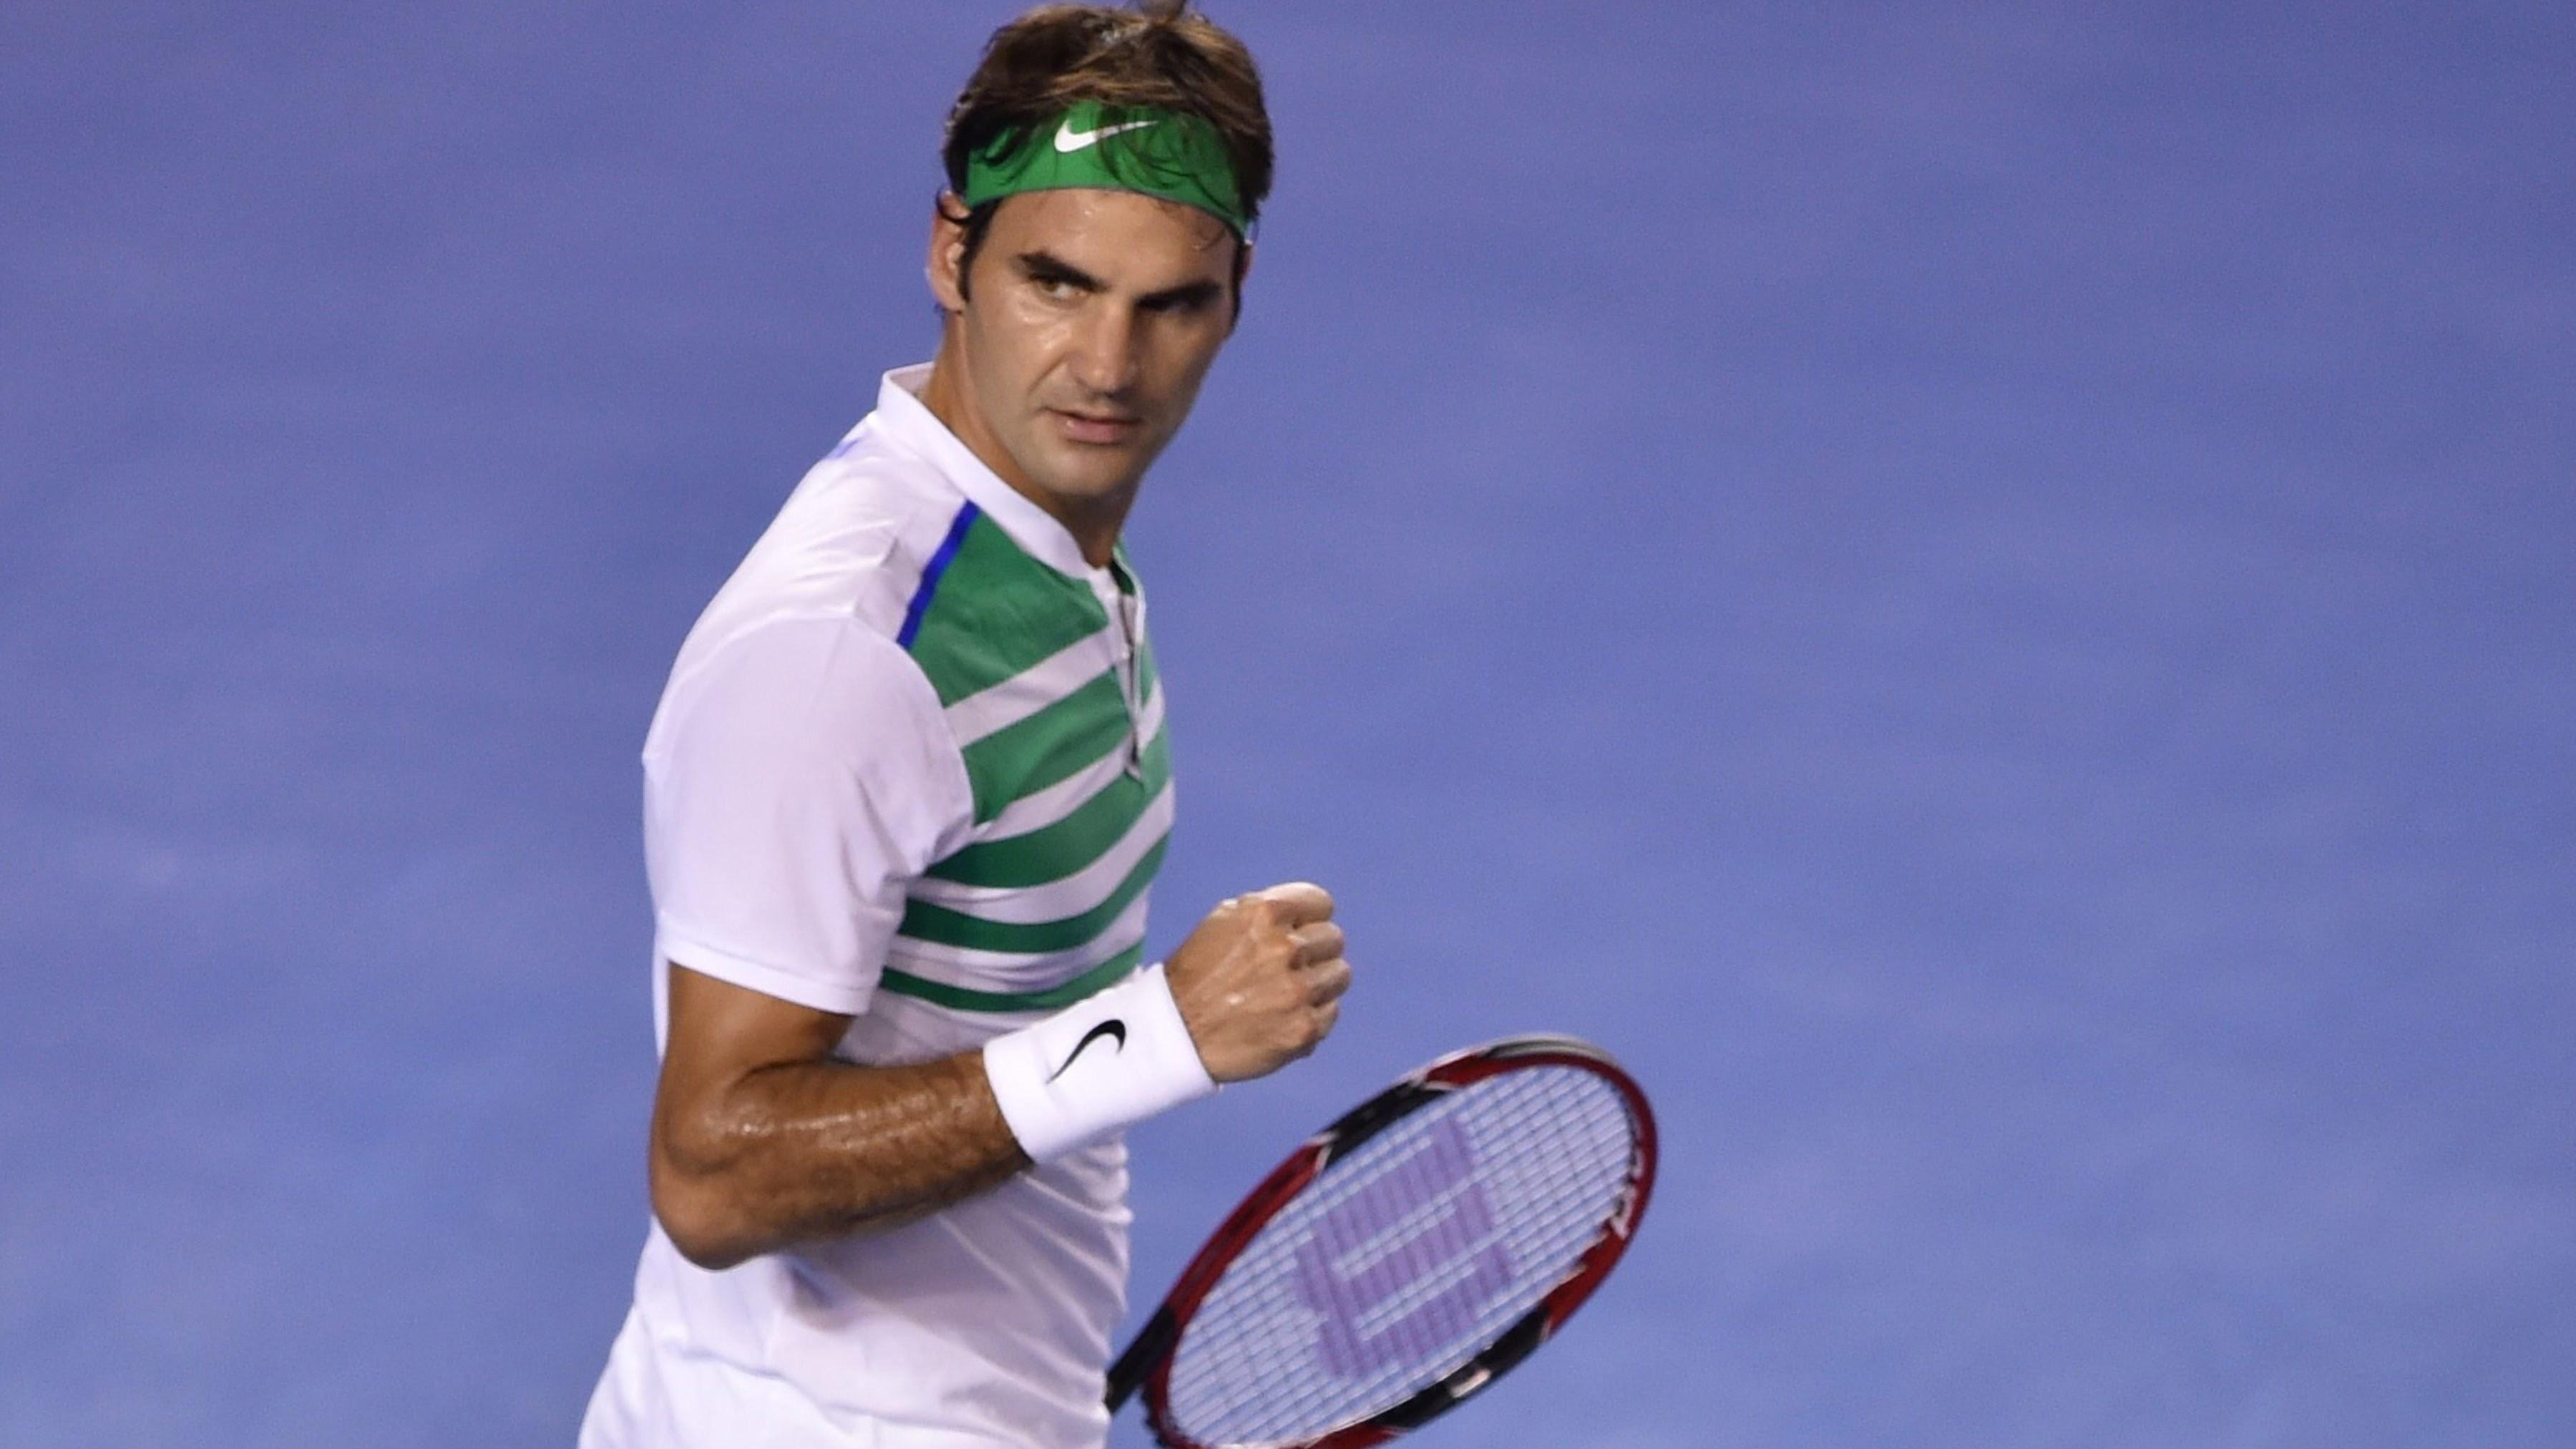 Roger Federer High Definition Wallpapers